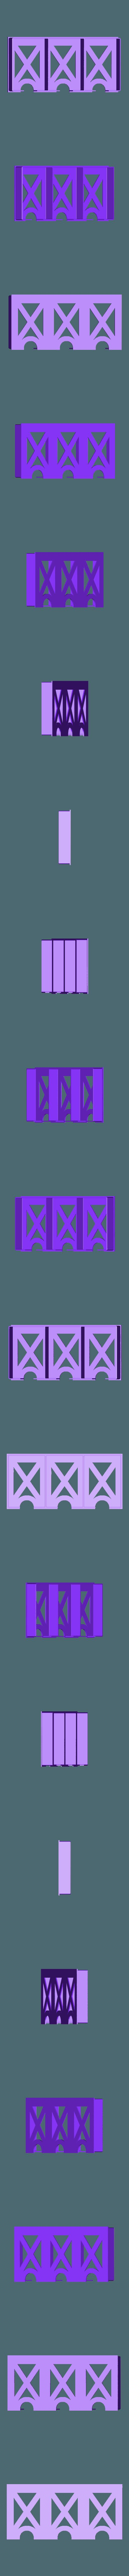 SoB_3_deck_holder_bottom.stl Download free STL file Shadows of brimstone box organizer • 3D print object, gthanatos